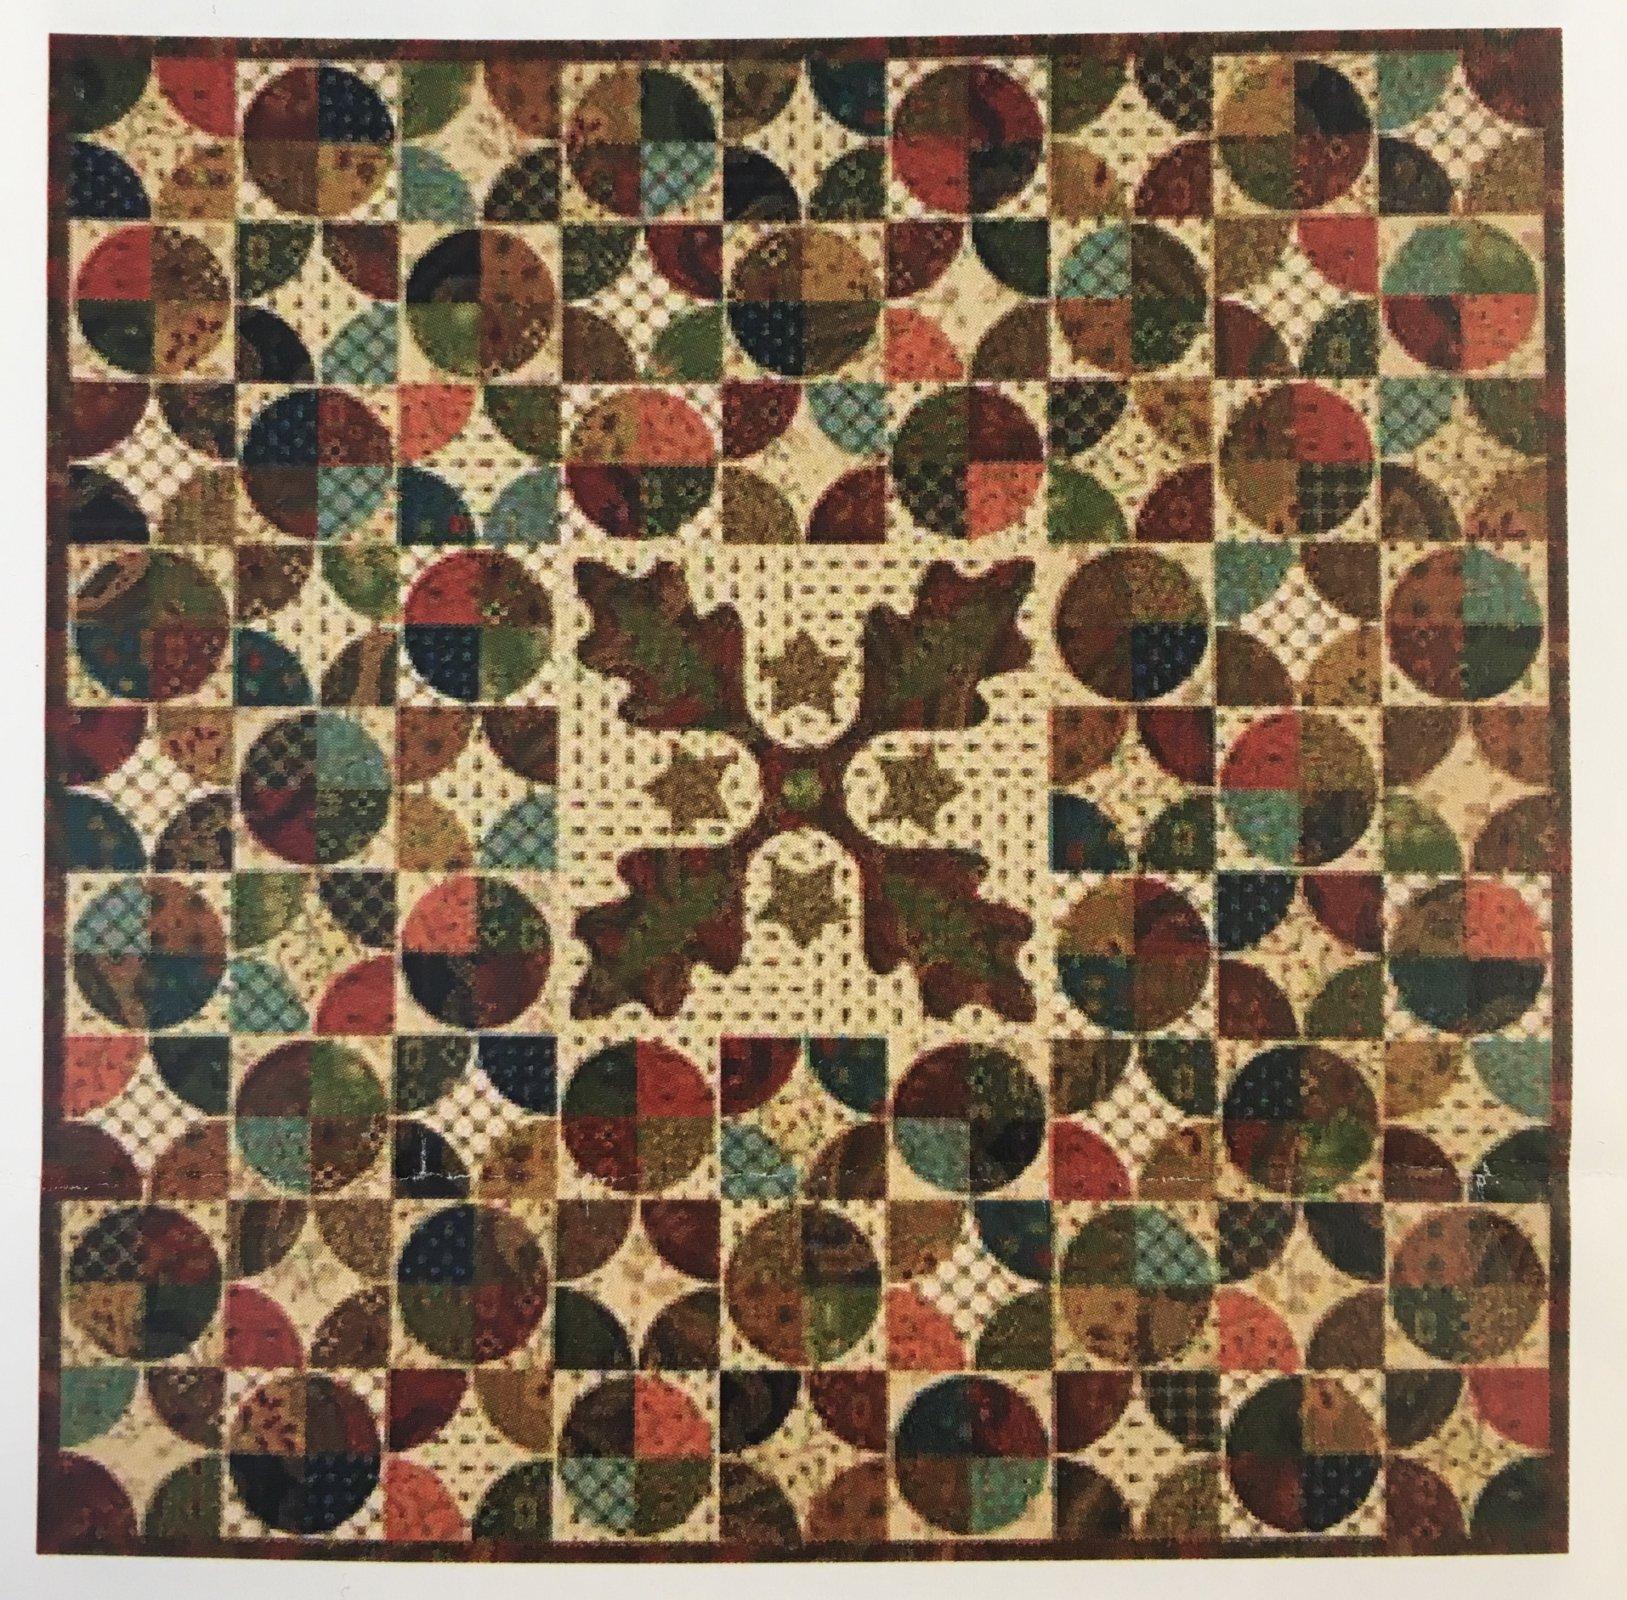 Autumn Tapestry- Kim Diehl Whatnots Kit - 18 1/2 x 18 1/2